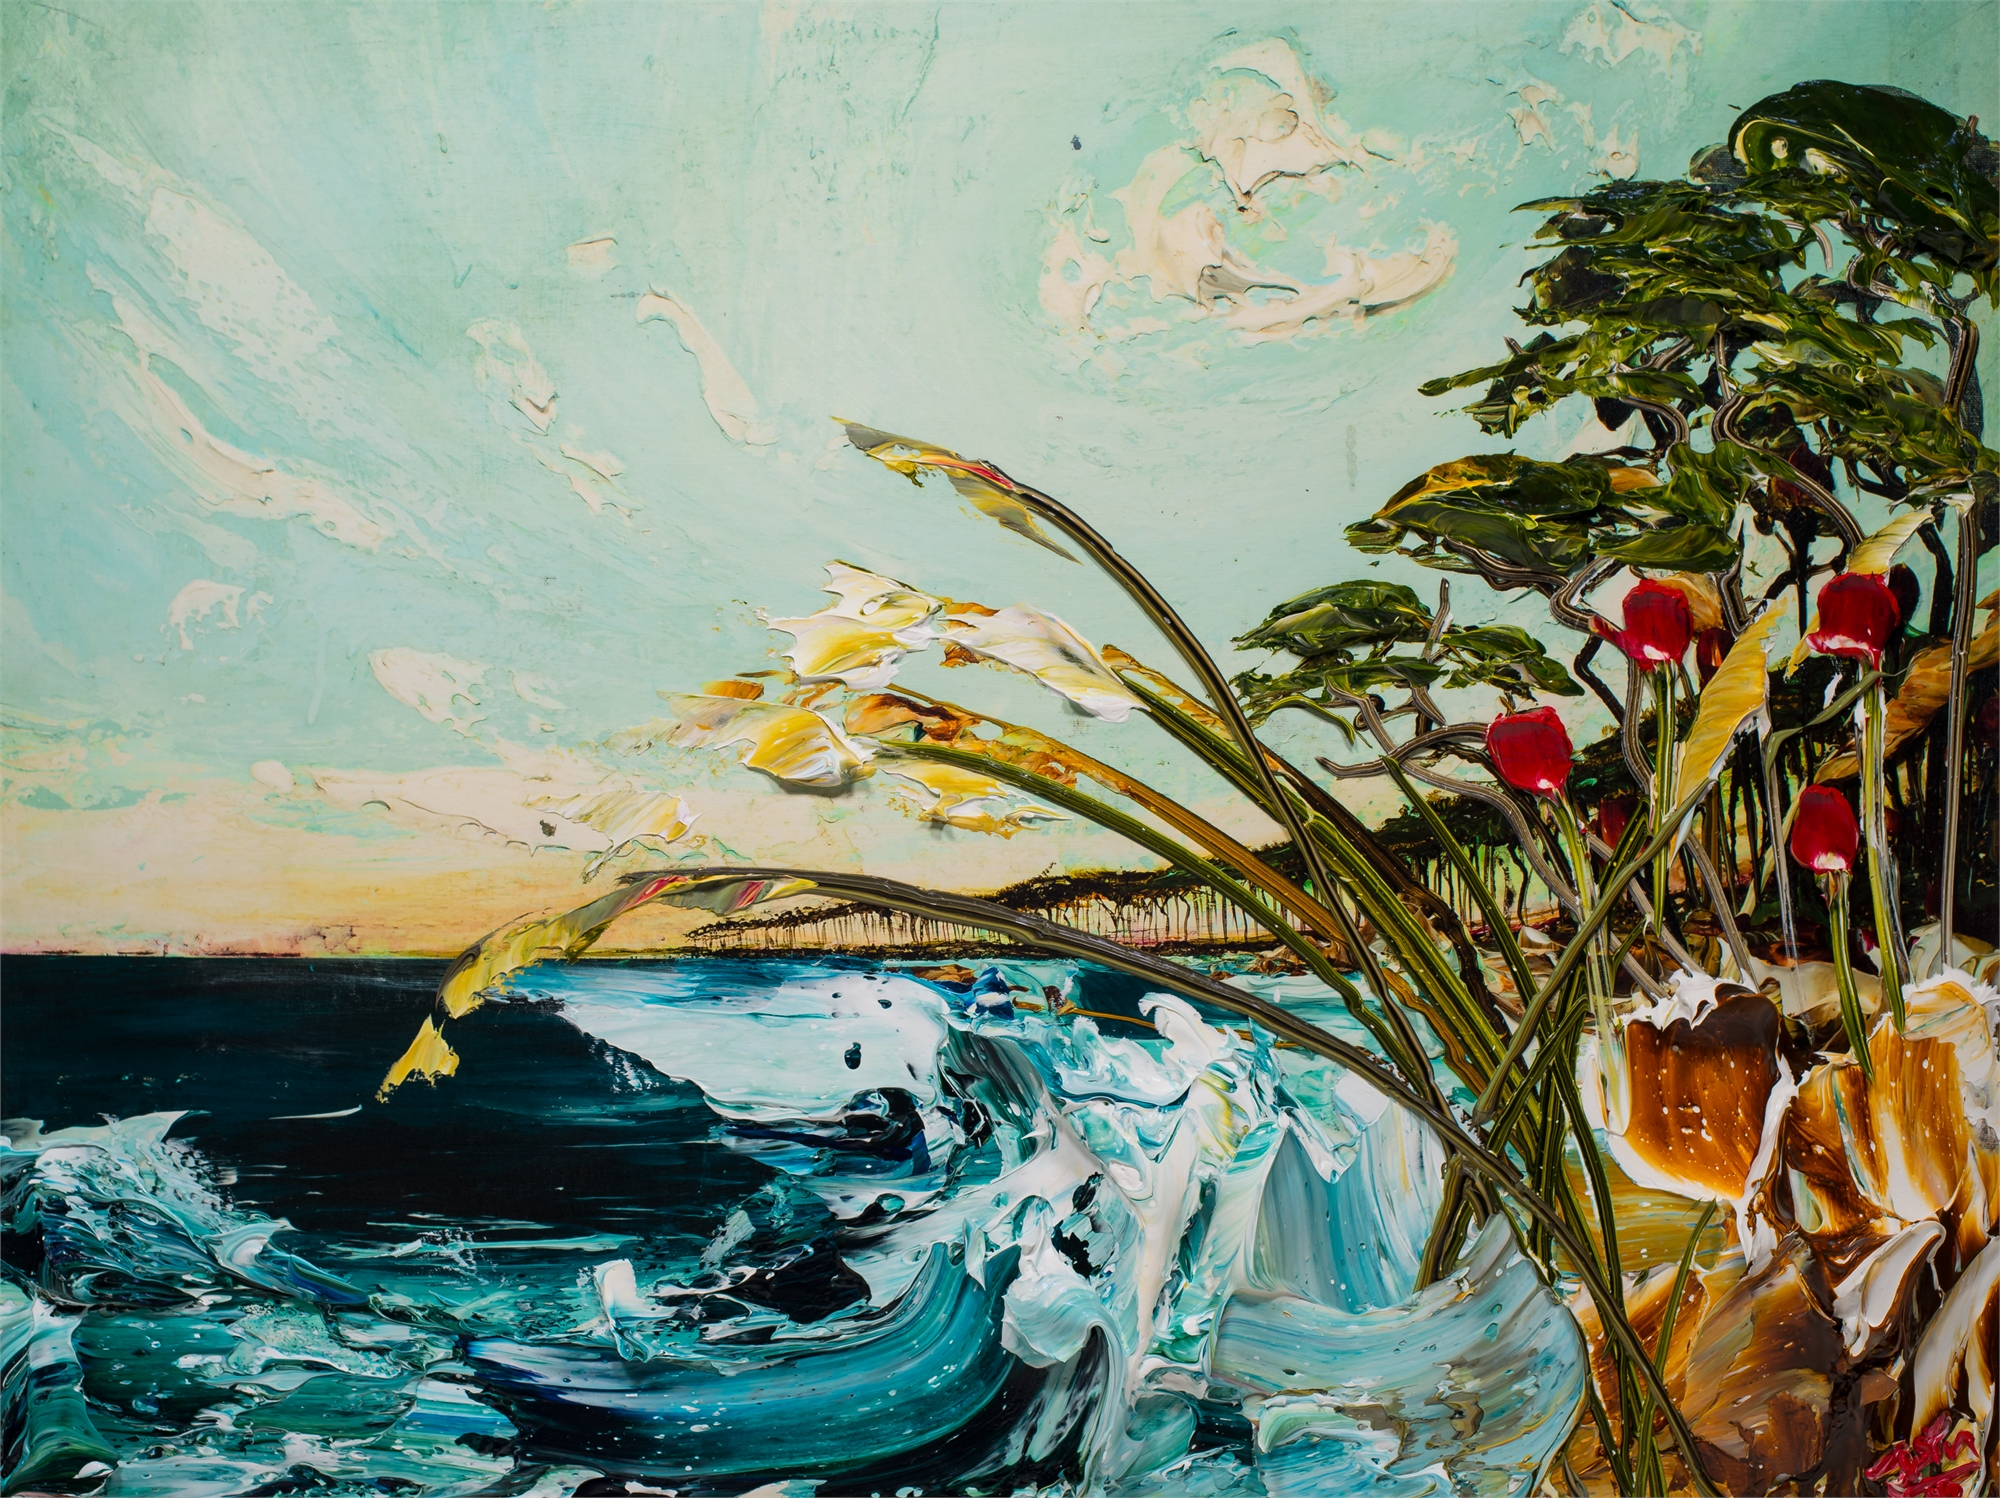 SEASCAPE HPAE33/50 by JUSTIN GAFFREY